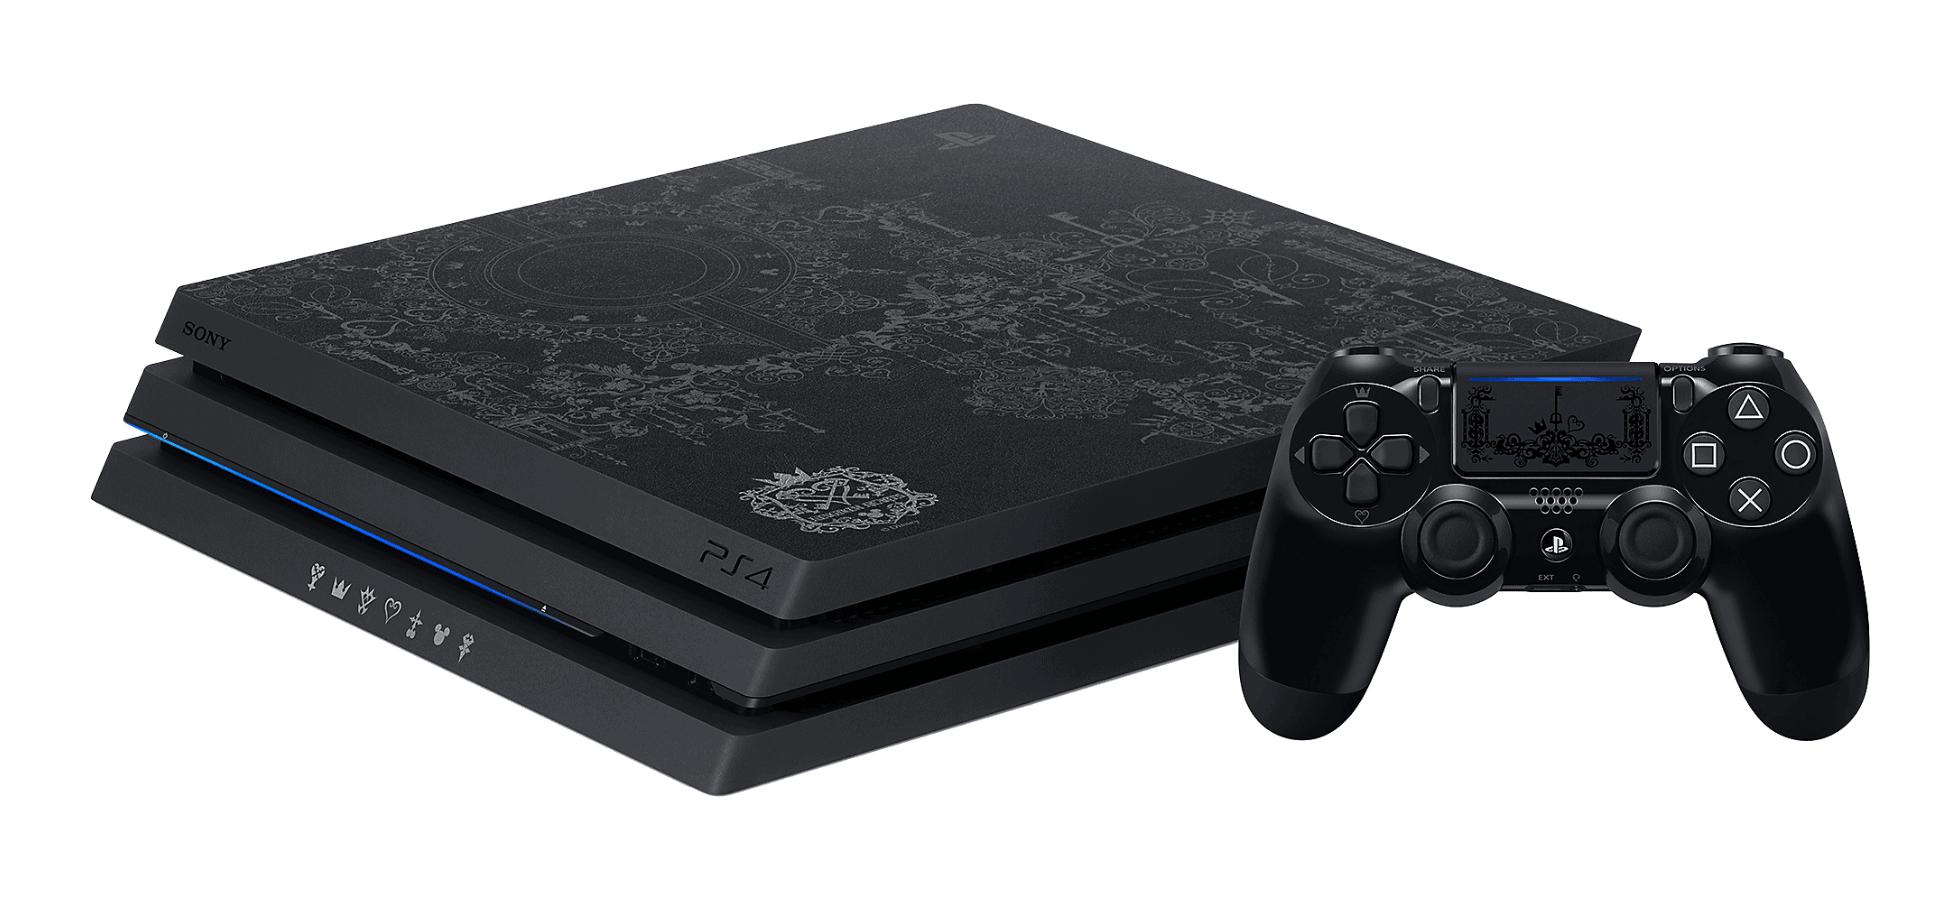 Special Edition Kingdom Hearts PS4 Pro